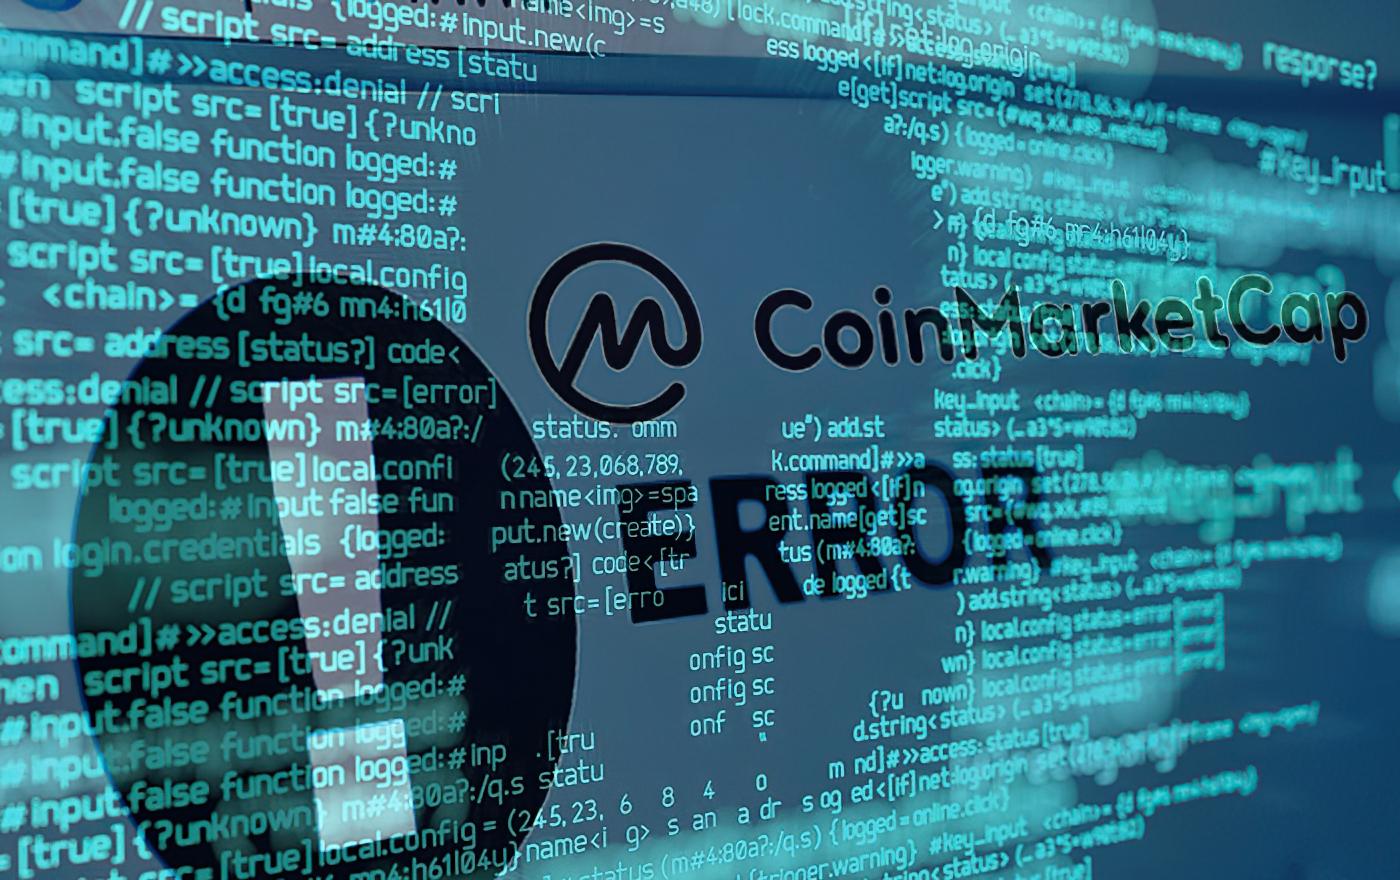 Coinmarketcap 驚傳遭駭,311萬用戶電郵資訊被盜賣